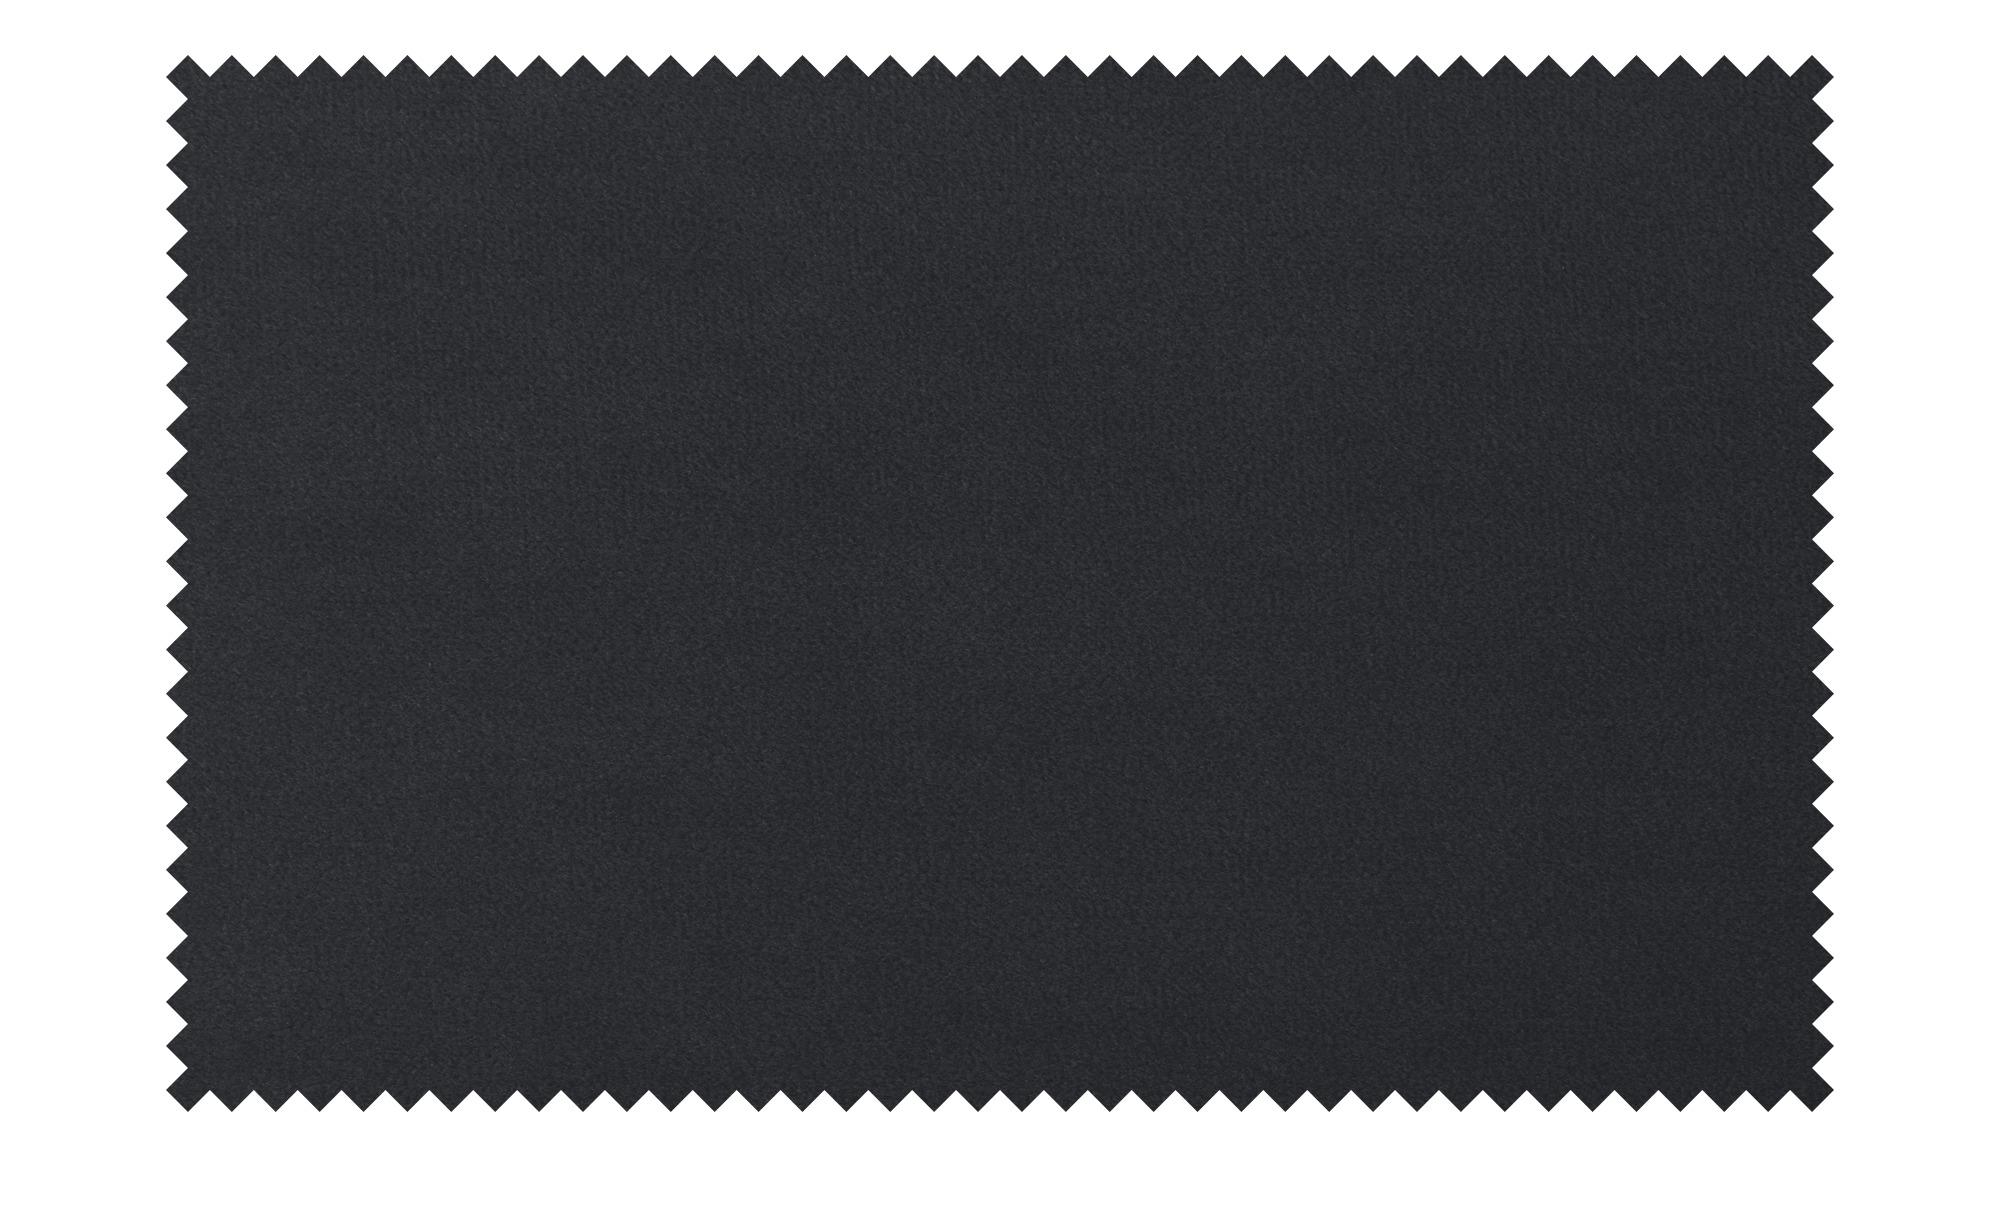 Hochlehnsessel  Caldara ¦ schwarz ¦ Maße (cm): B: 100 H: 106 T: 95 Polstermöbel > Sessel > Polstersessel - Höffner